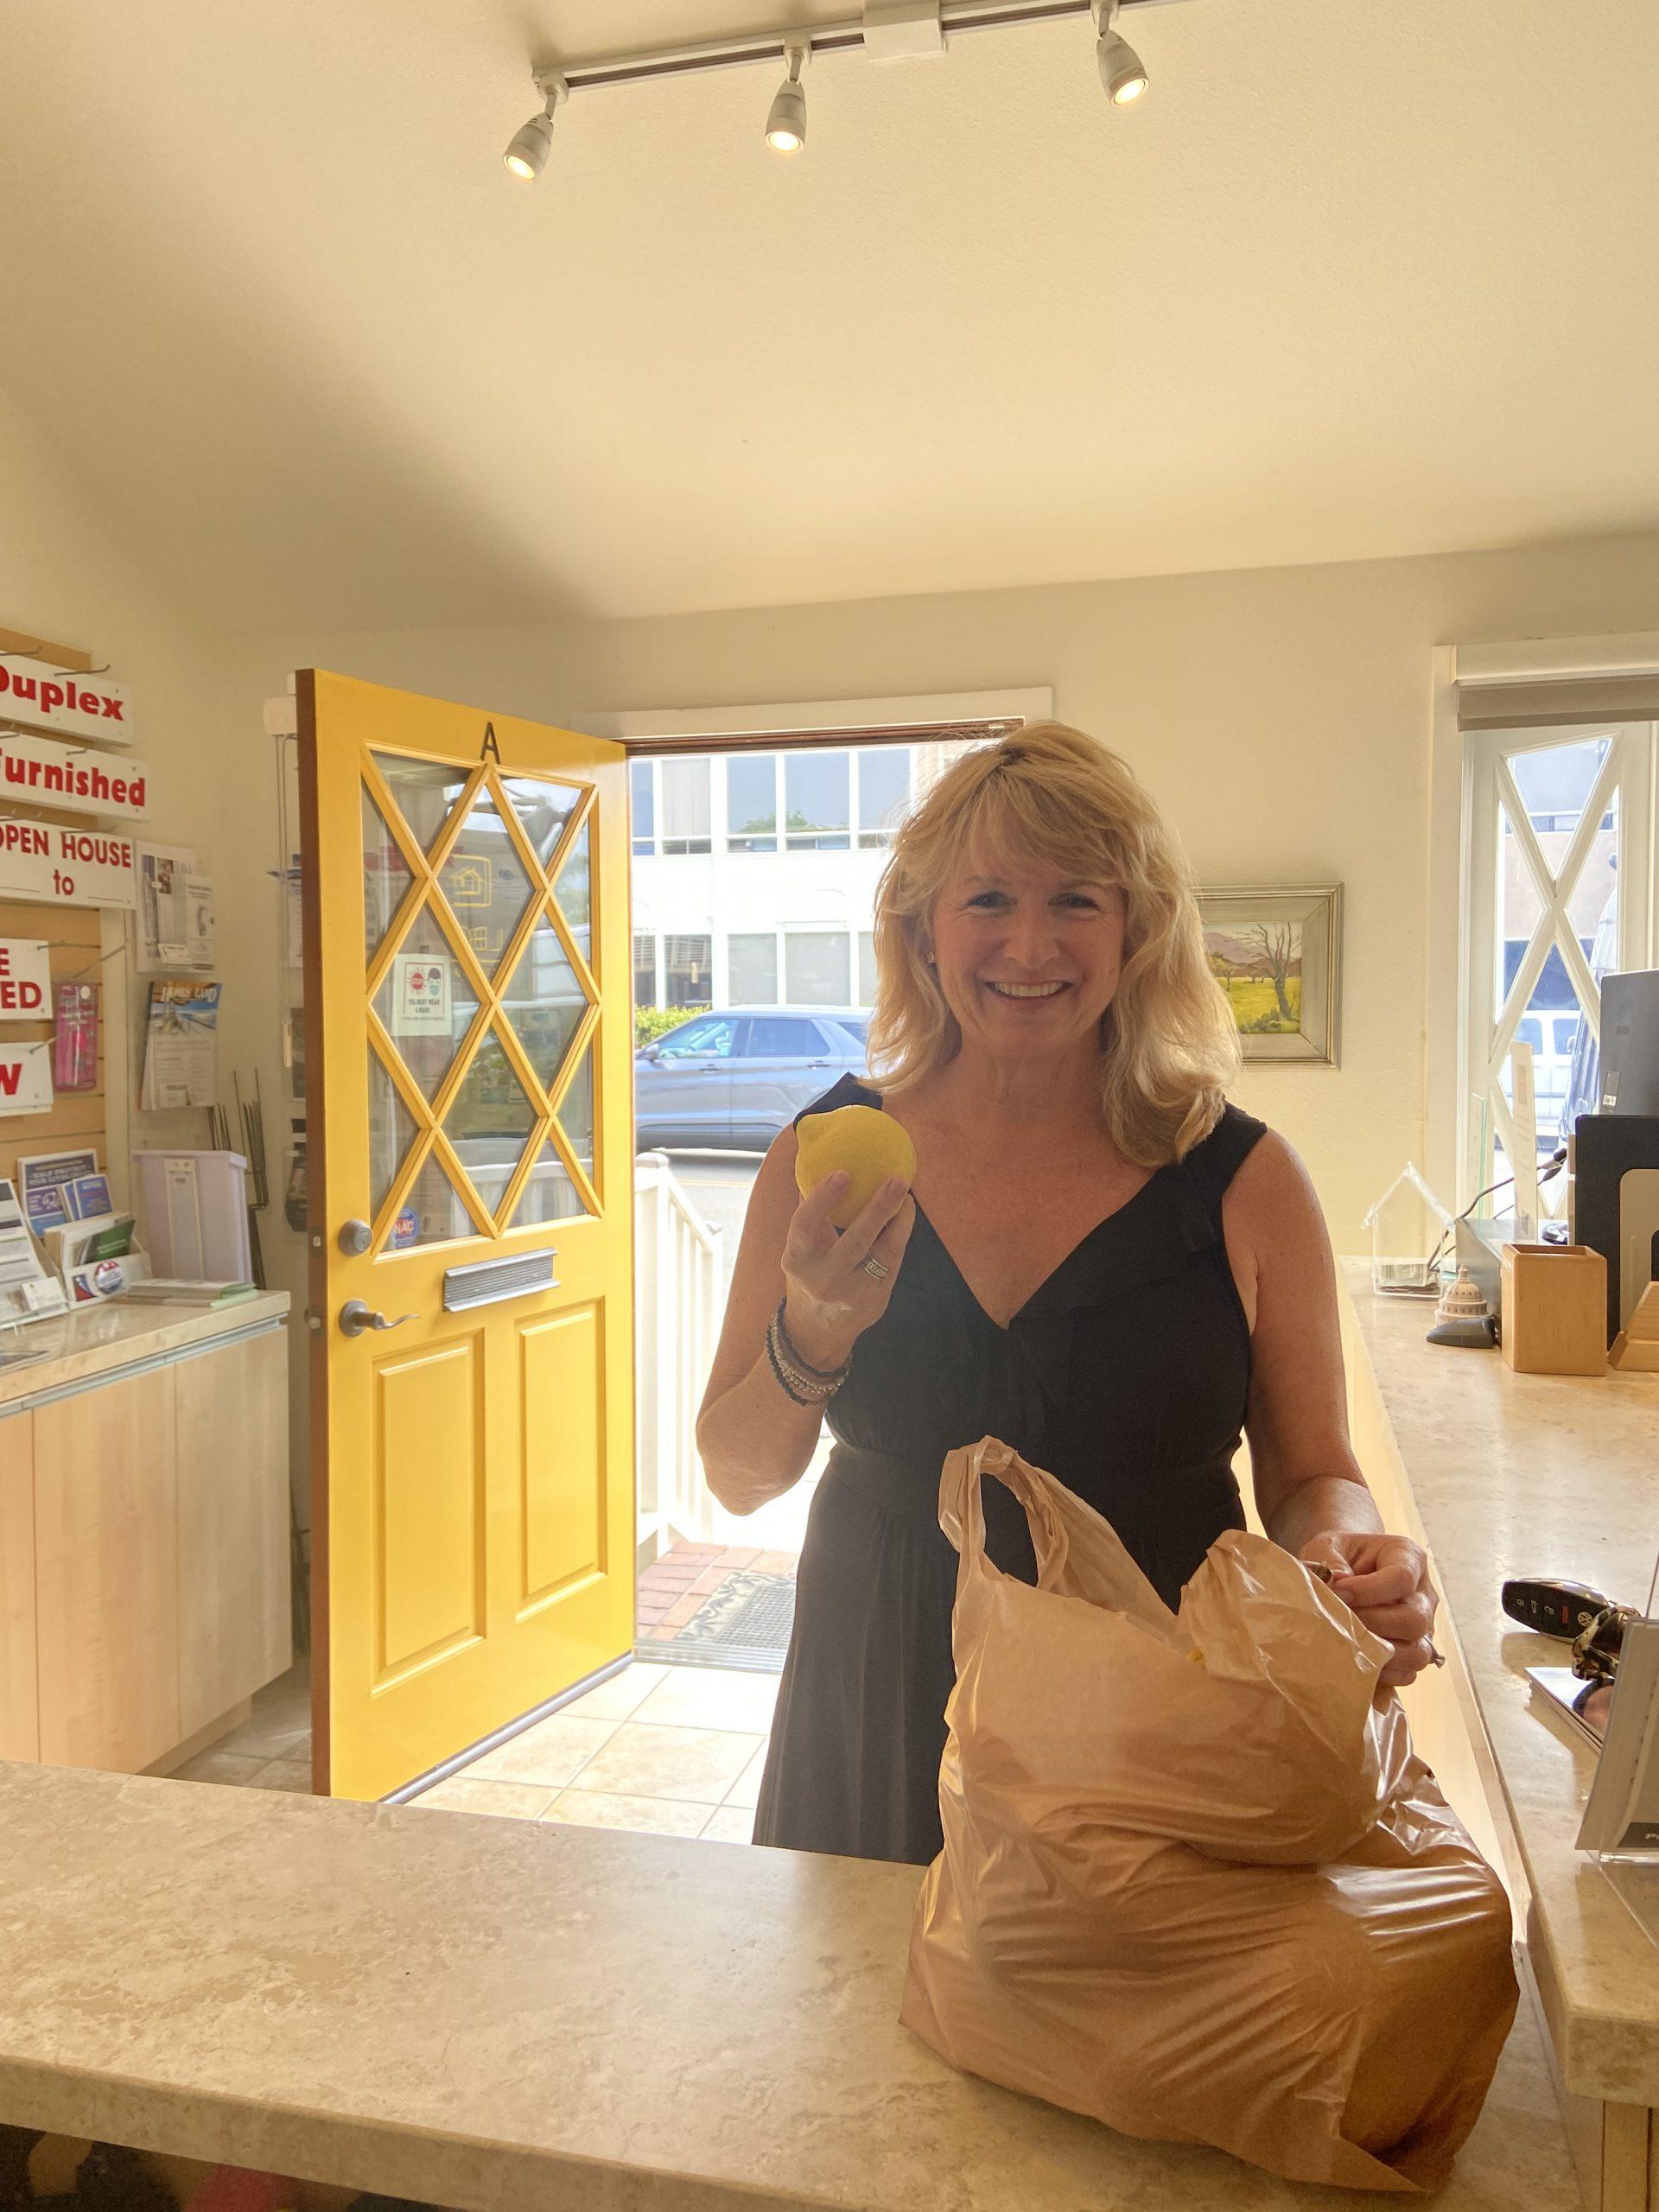 Laguna Realtor association donates homegrown produce to food pantry